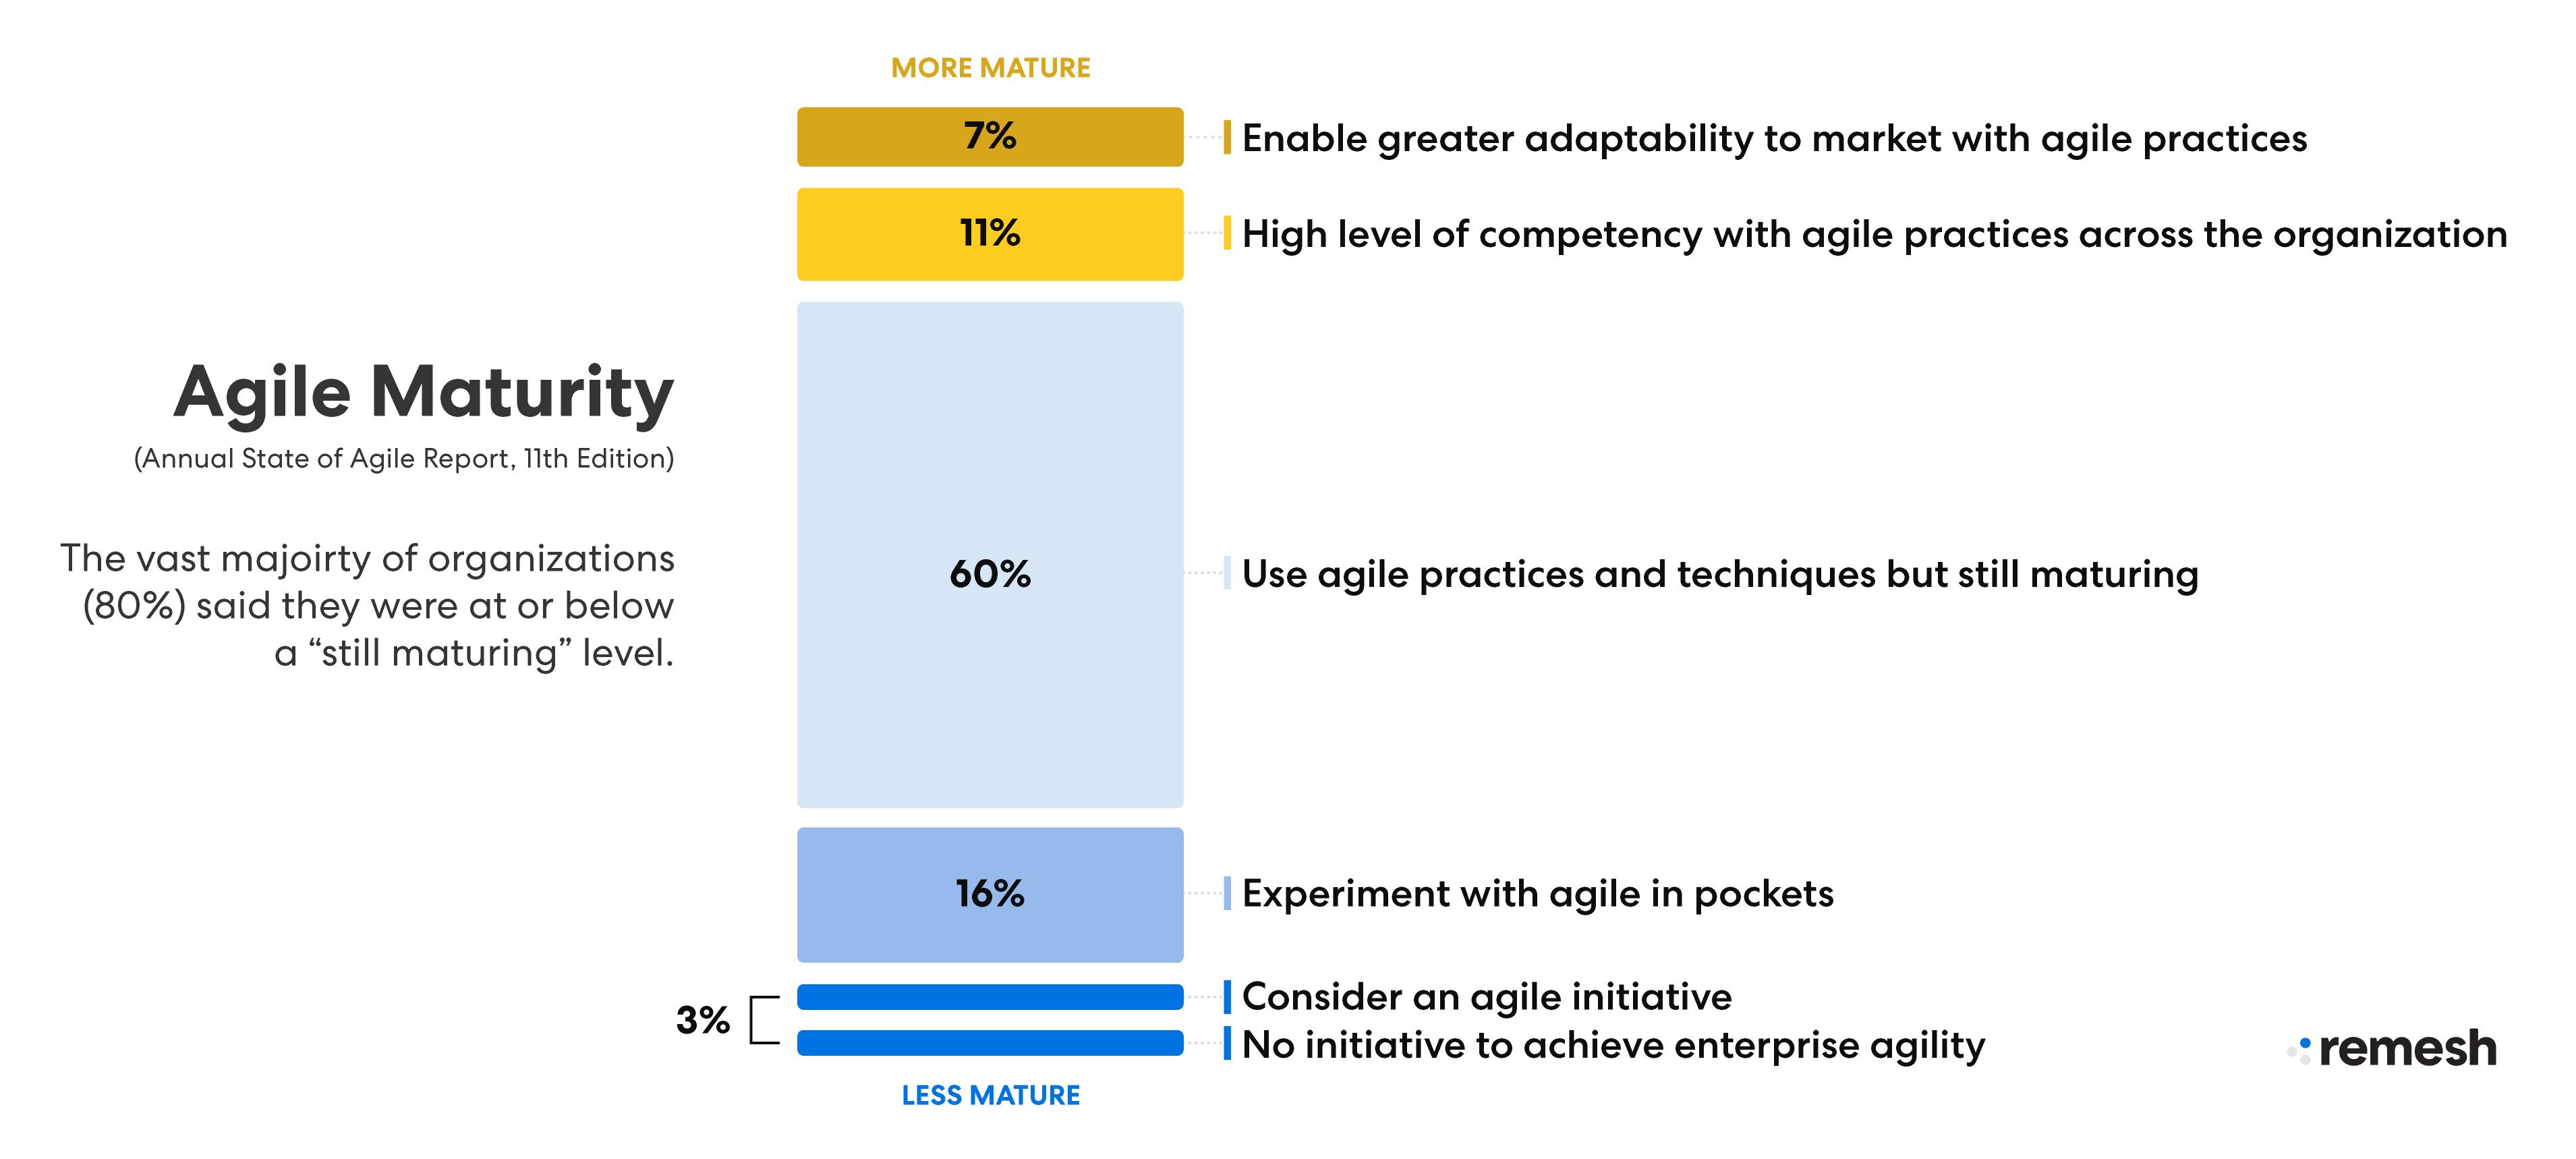 Agile Maturity graphic state of agile report